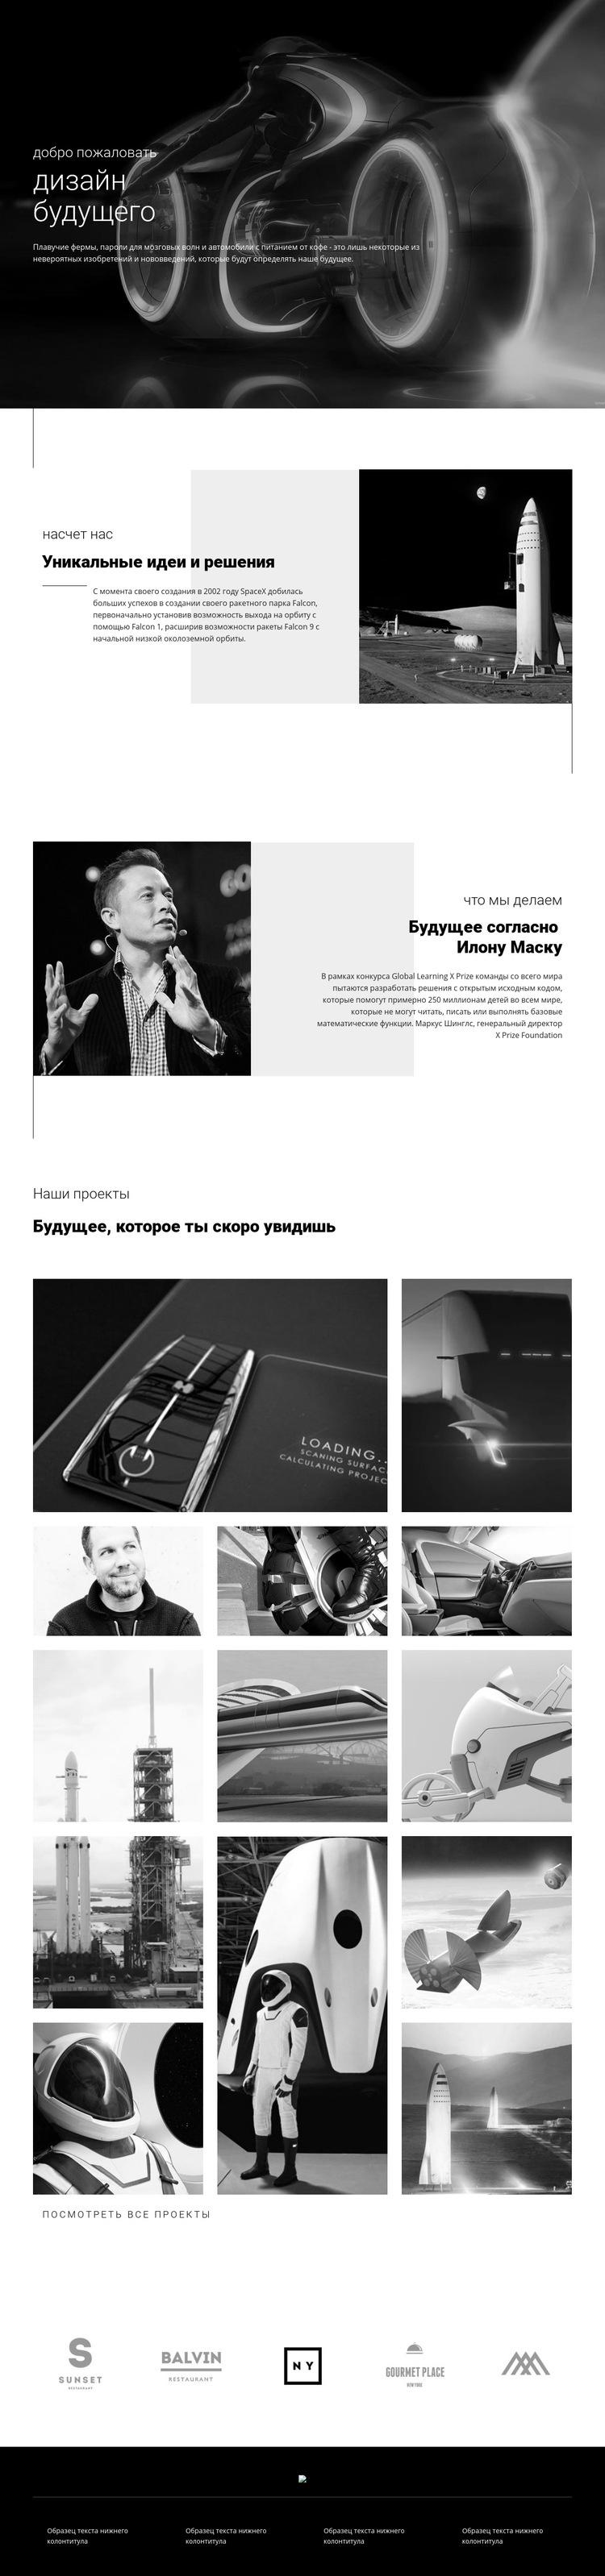 Дизайн технологий будущего Шаблон веб-сайта